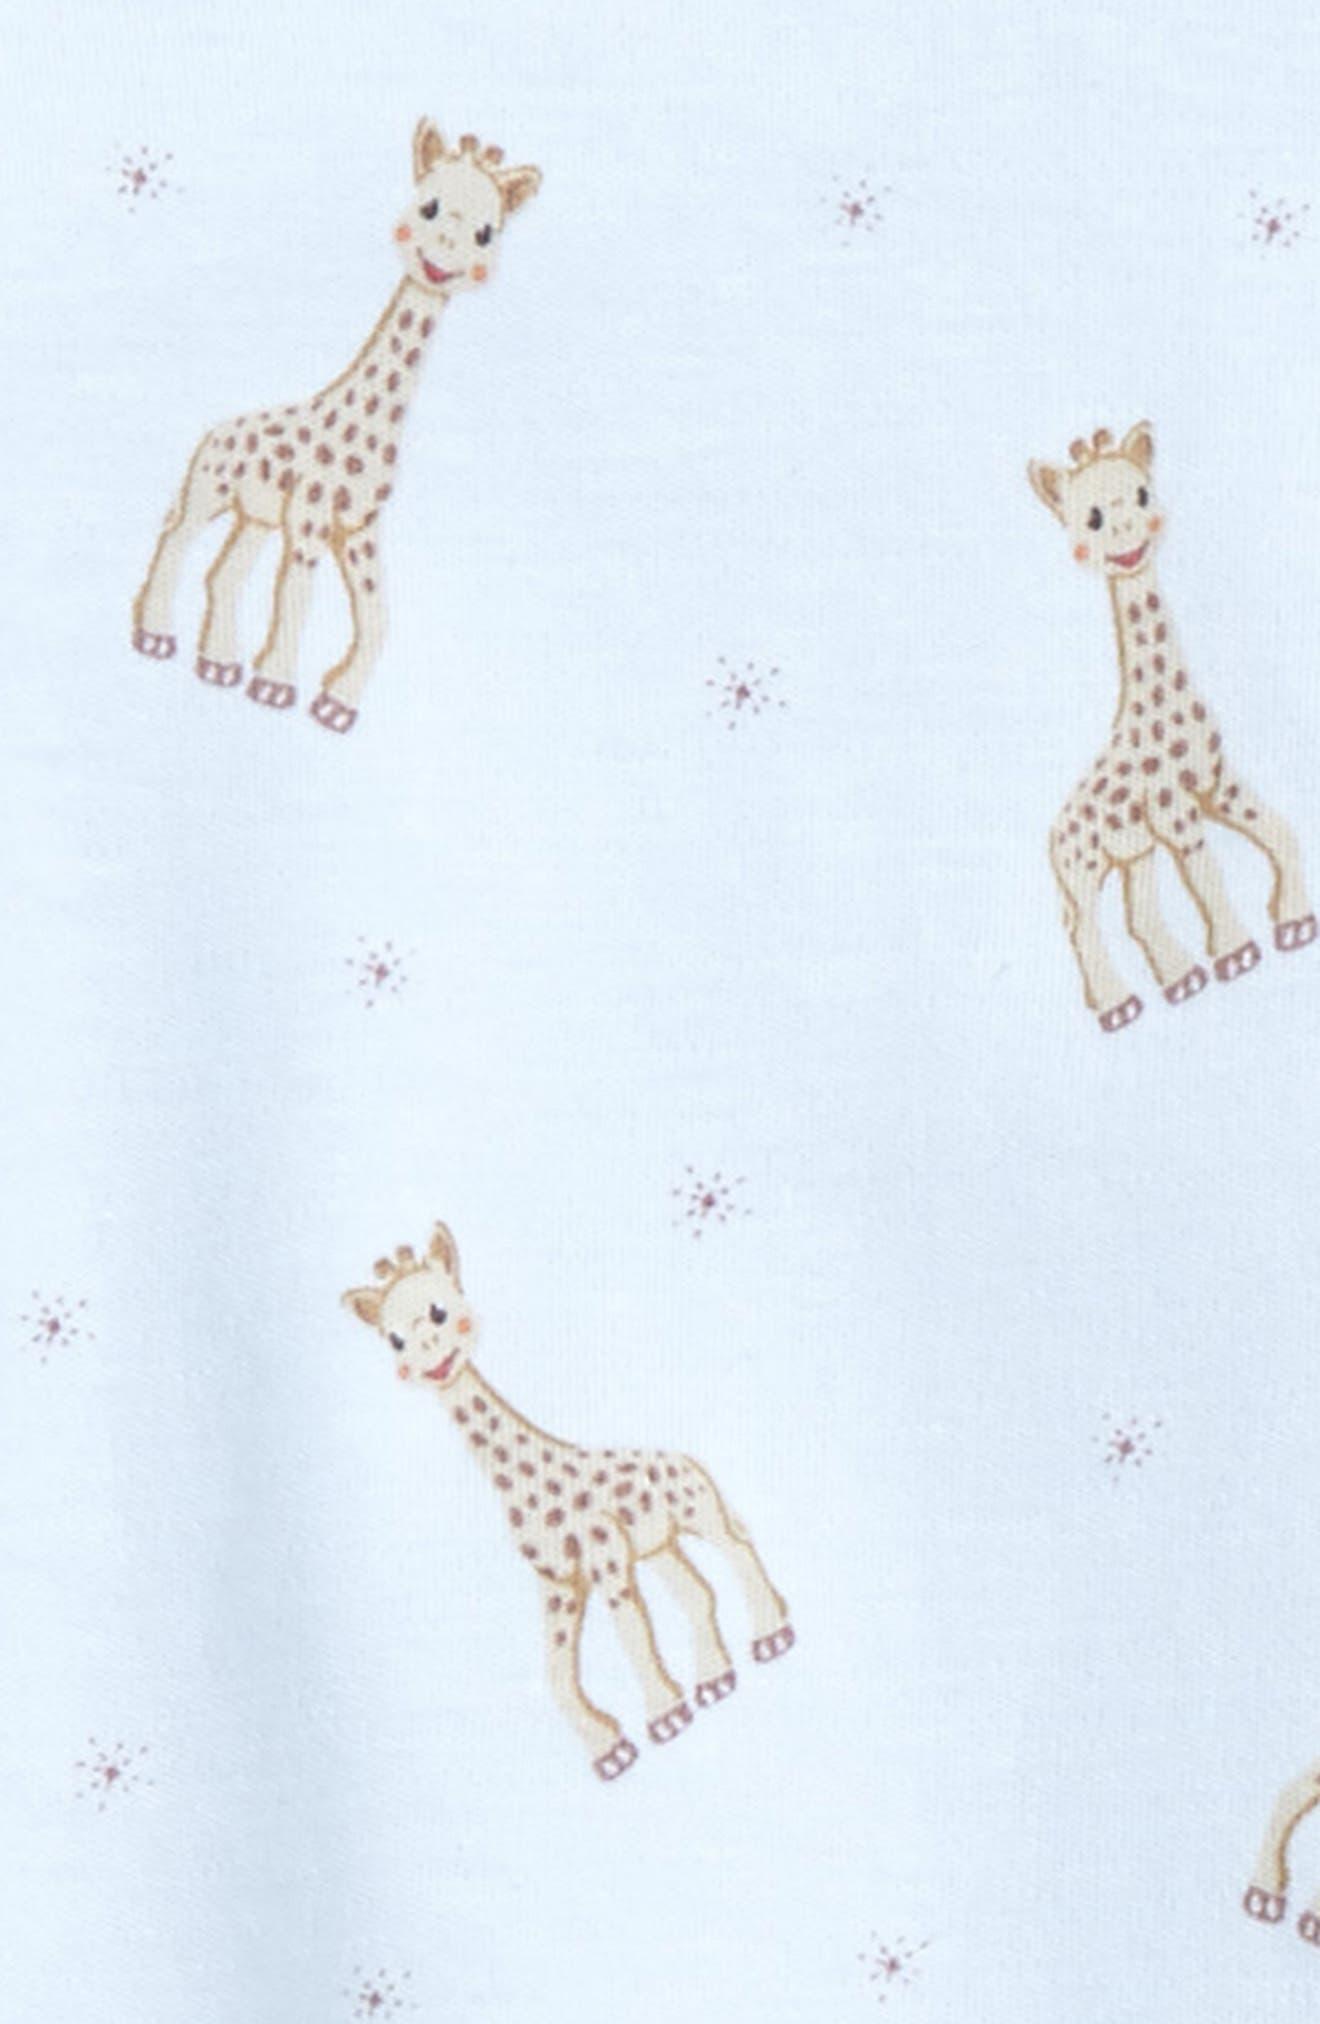 Alternate Image 2  - Kissy Kissy Sophie la Girafe Fitted Two-Piece Pajamas (Baby Boys)